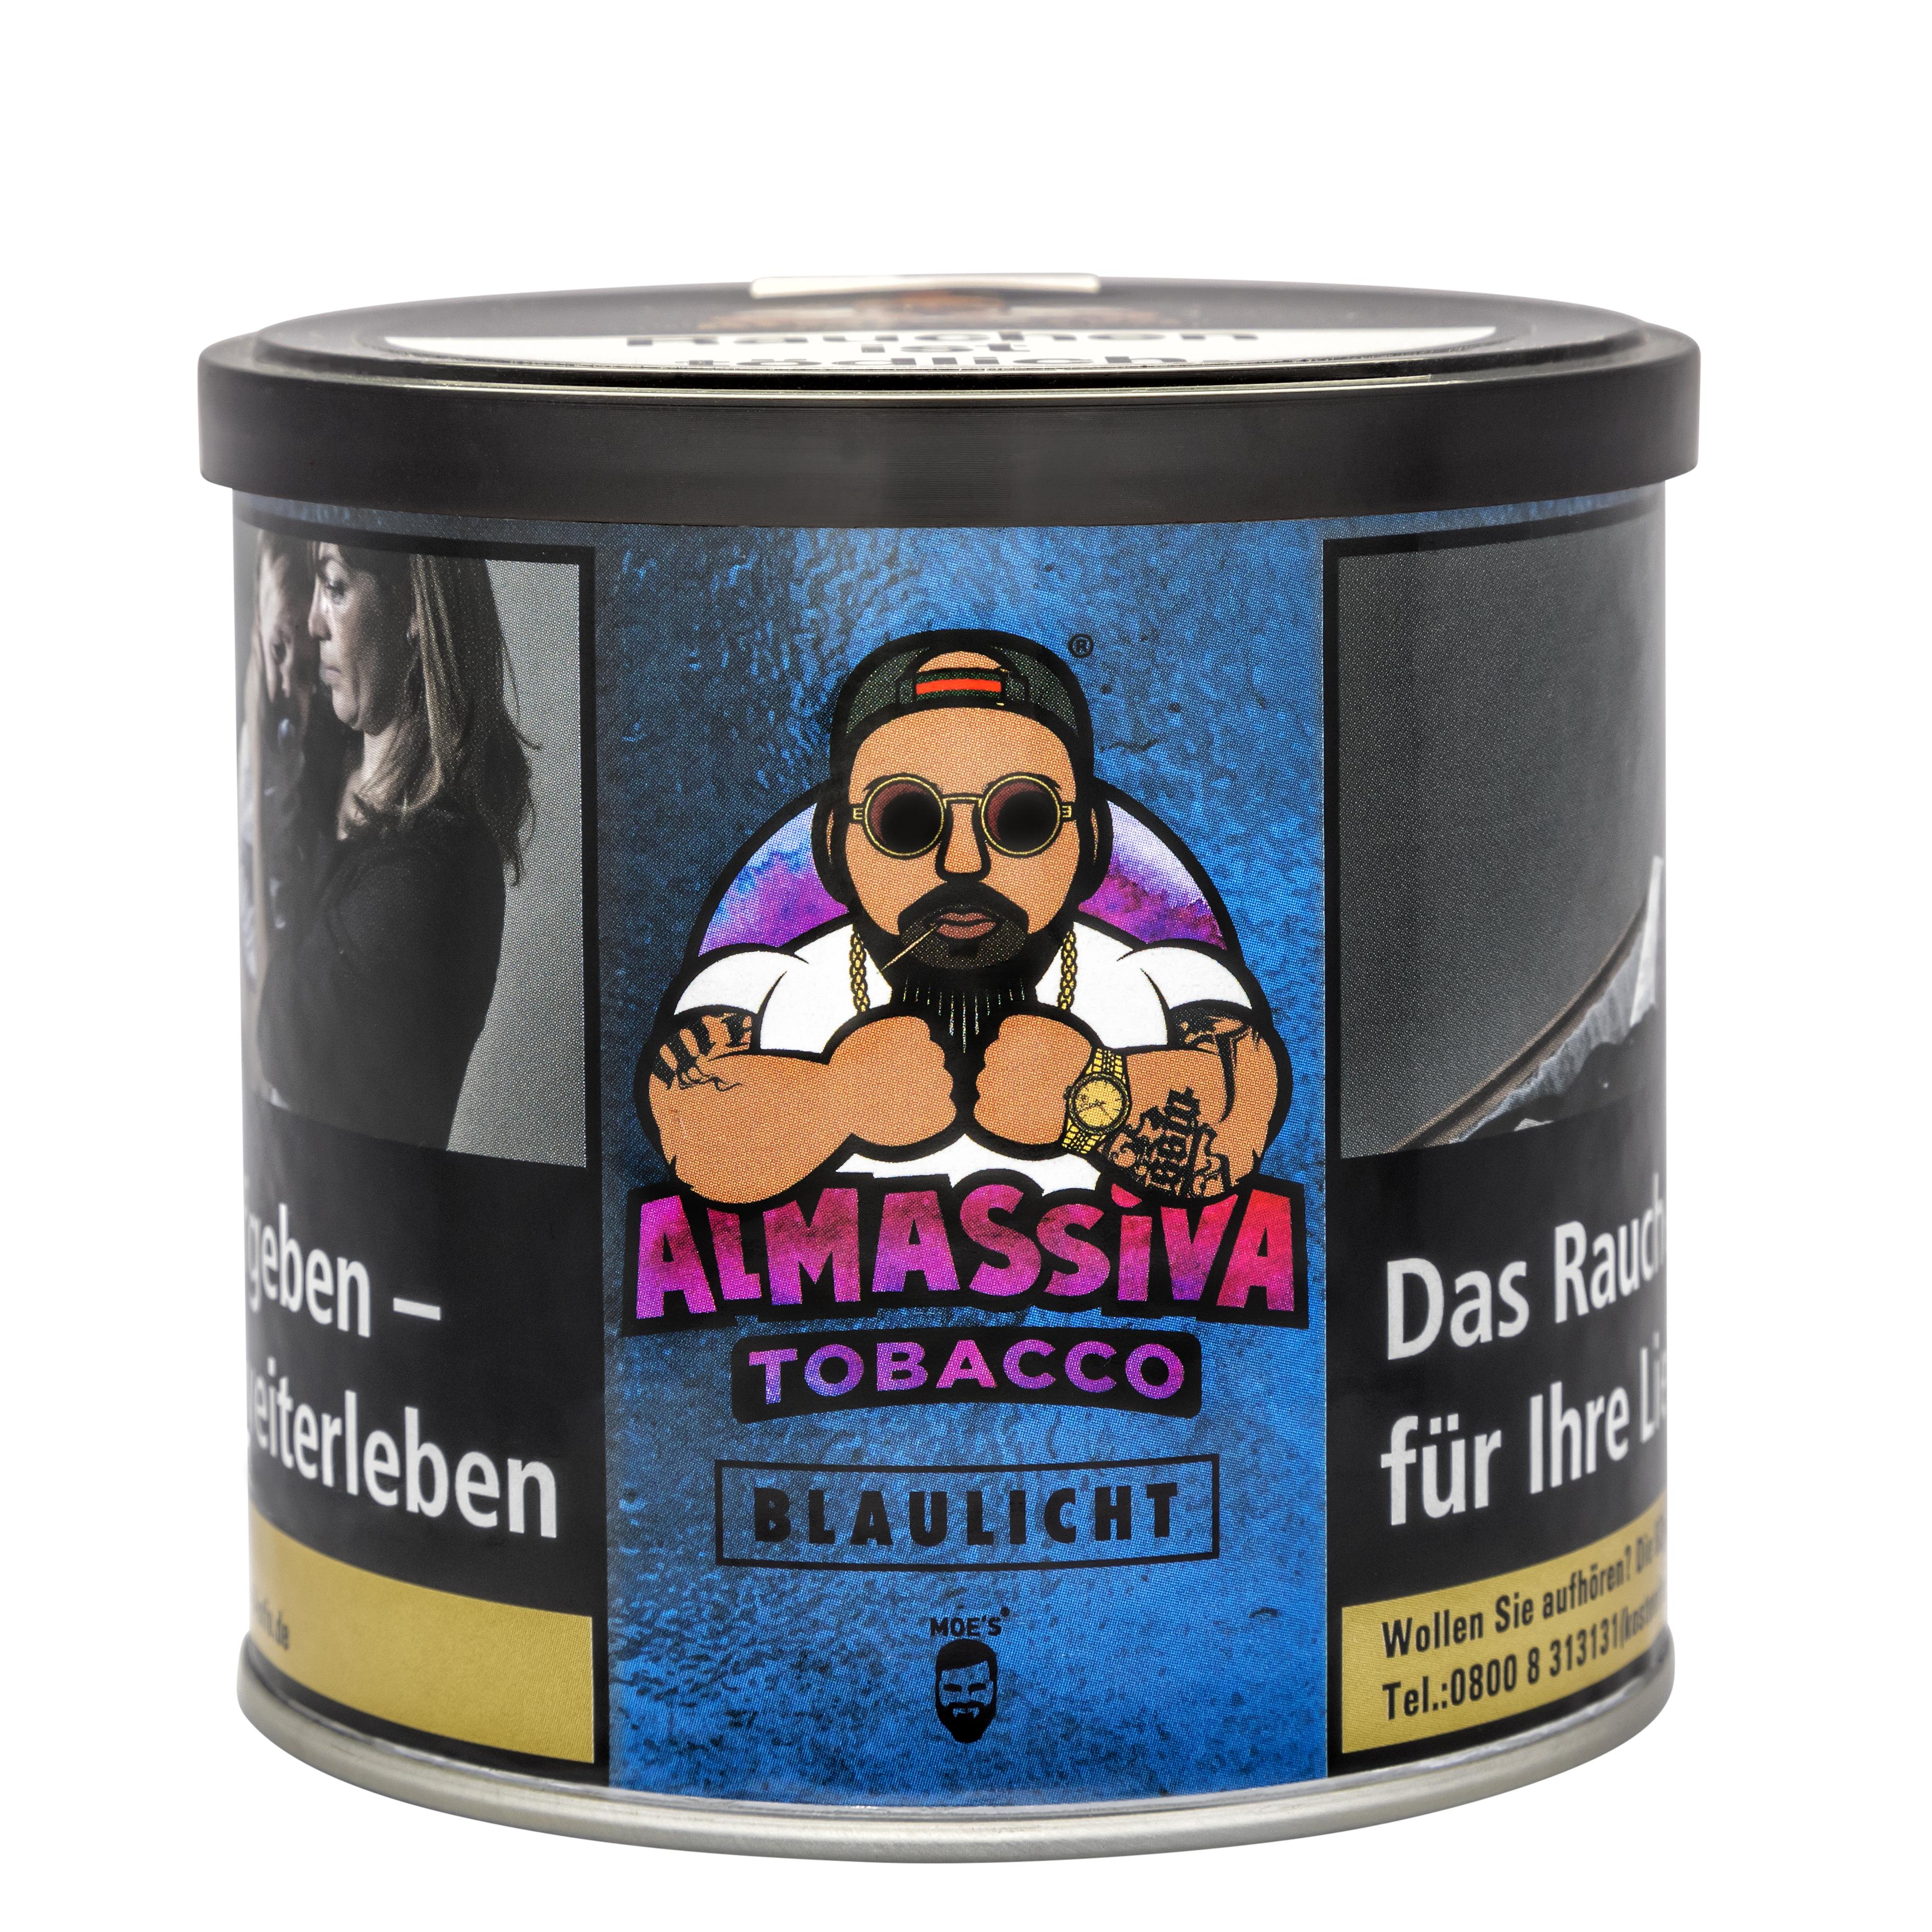 "ALMASSIVA ""BLAULICHT"" SHISHA TABAK BLAUBEERE"